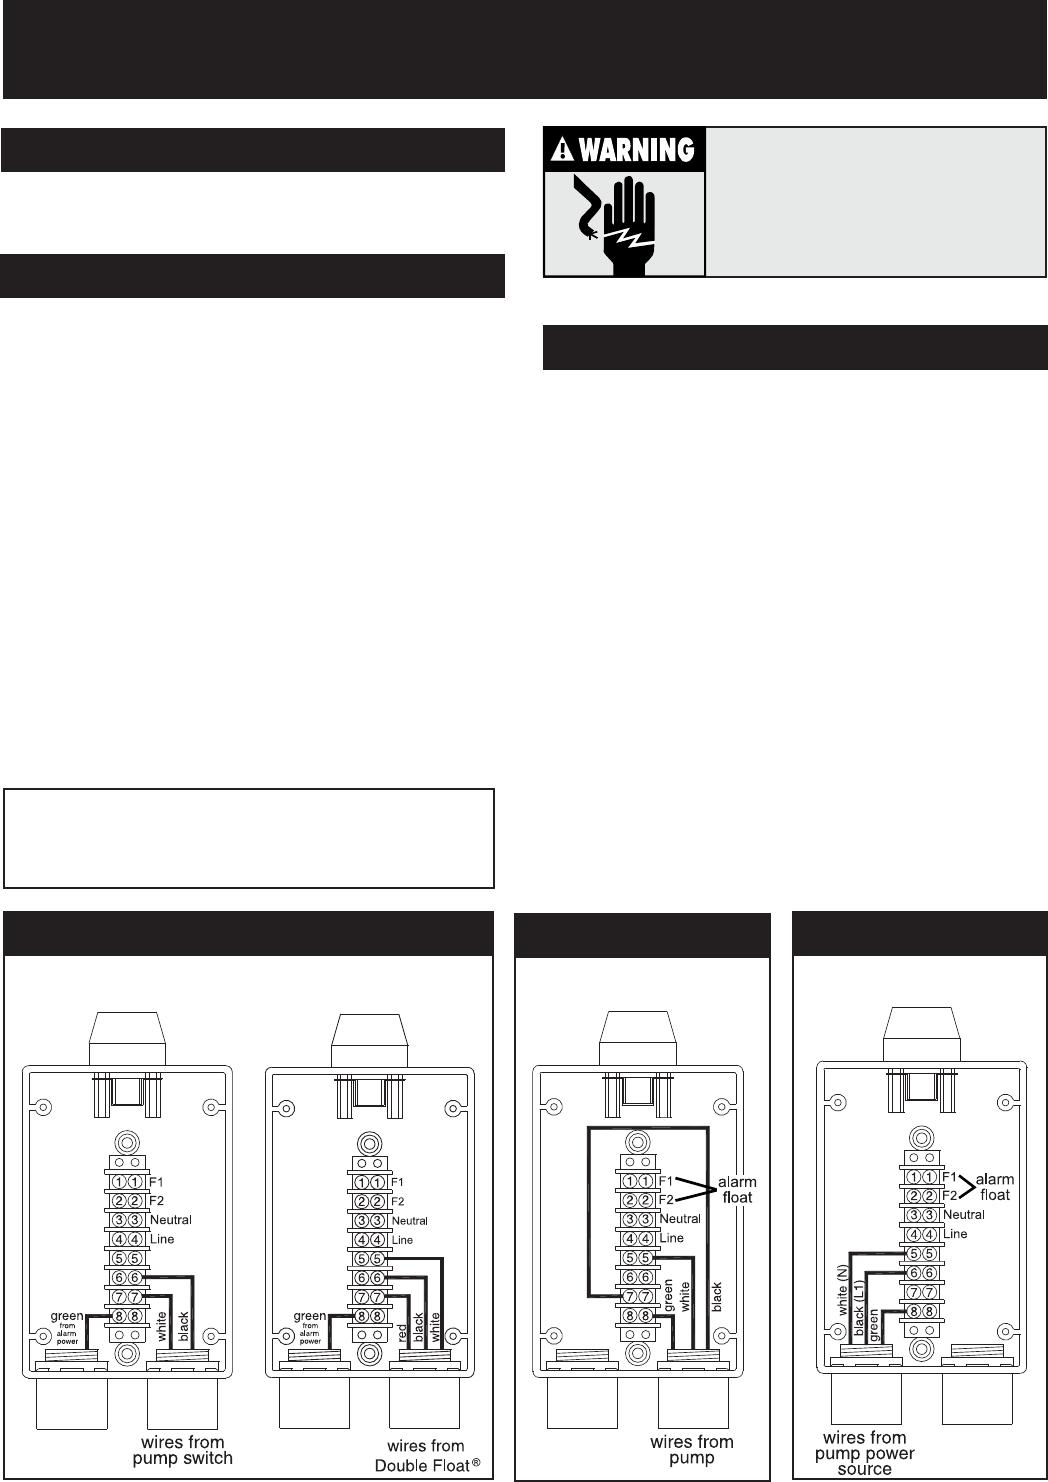 hight resolution of tank alert wiring diagram wiring diagram show tank alert wiring diagram